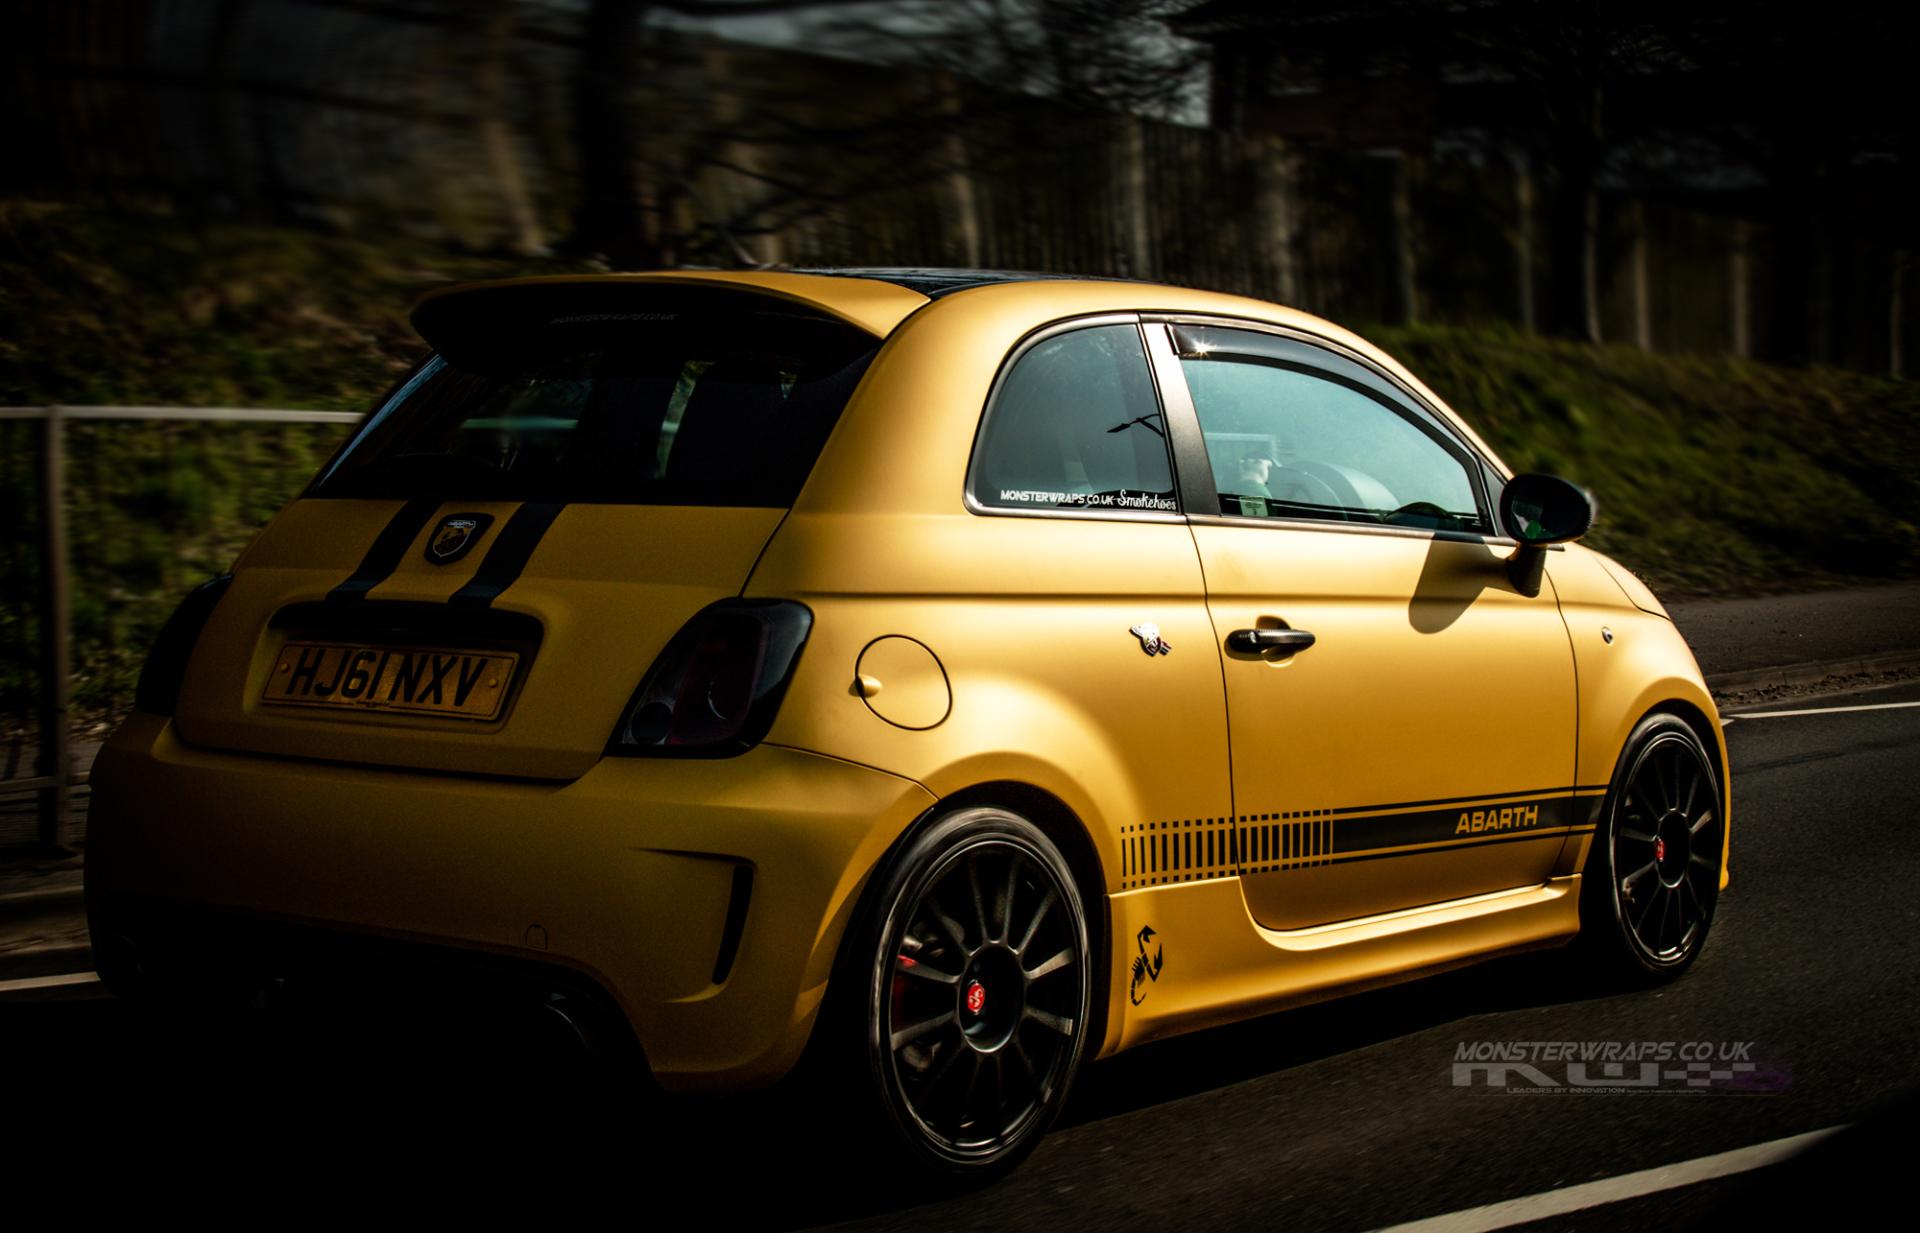 Fiat Abarth Matte Metallic Yellow Full Wrap Monsterwraps